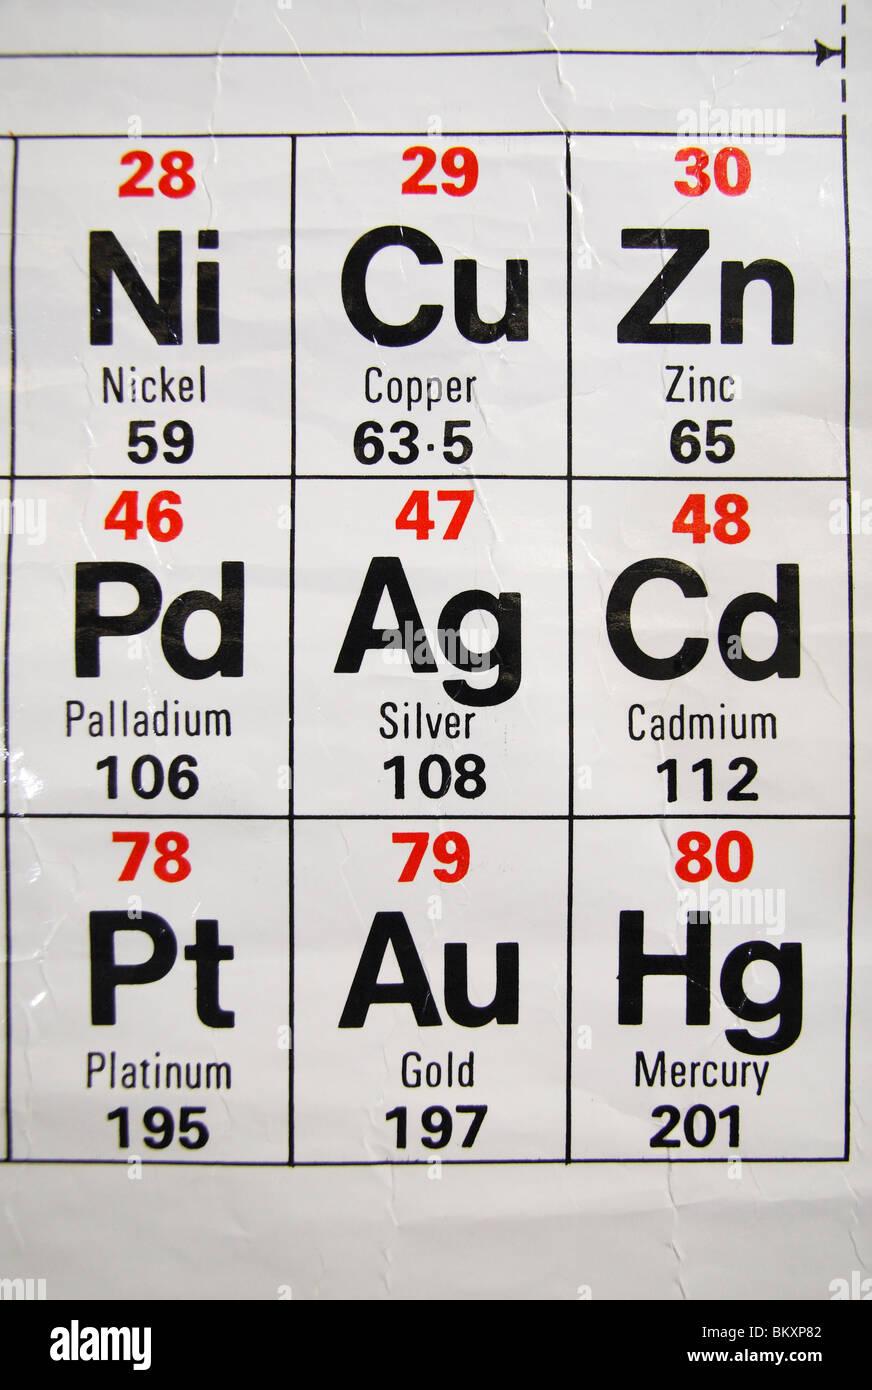 Close up view of a standard uk high school periodic table stock close up view of a standard uk high school periodic table gamestrikefo Choice Image